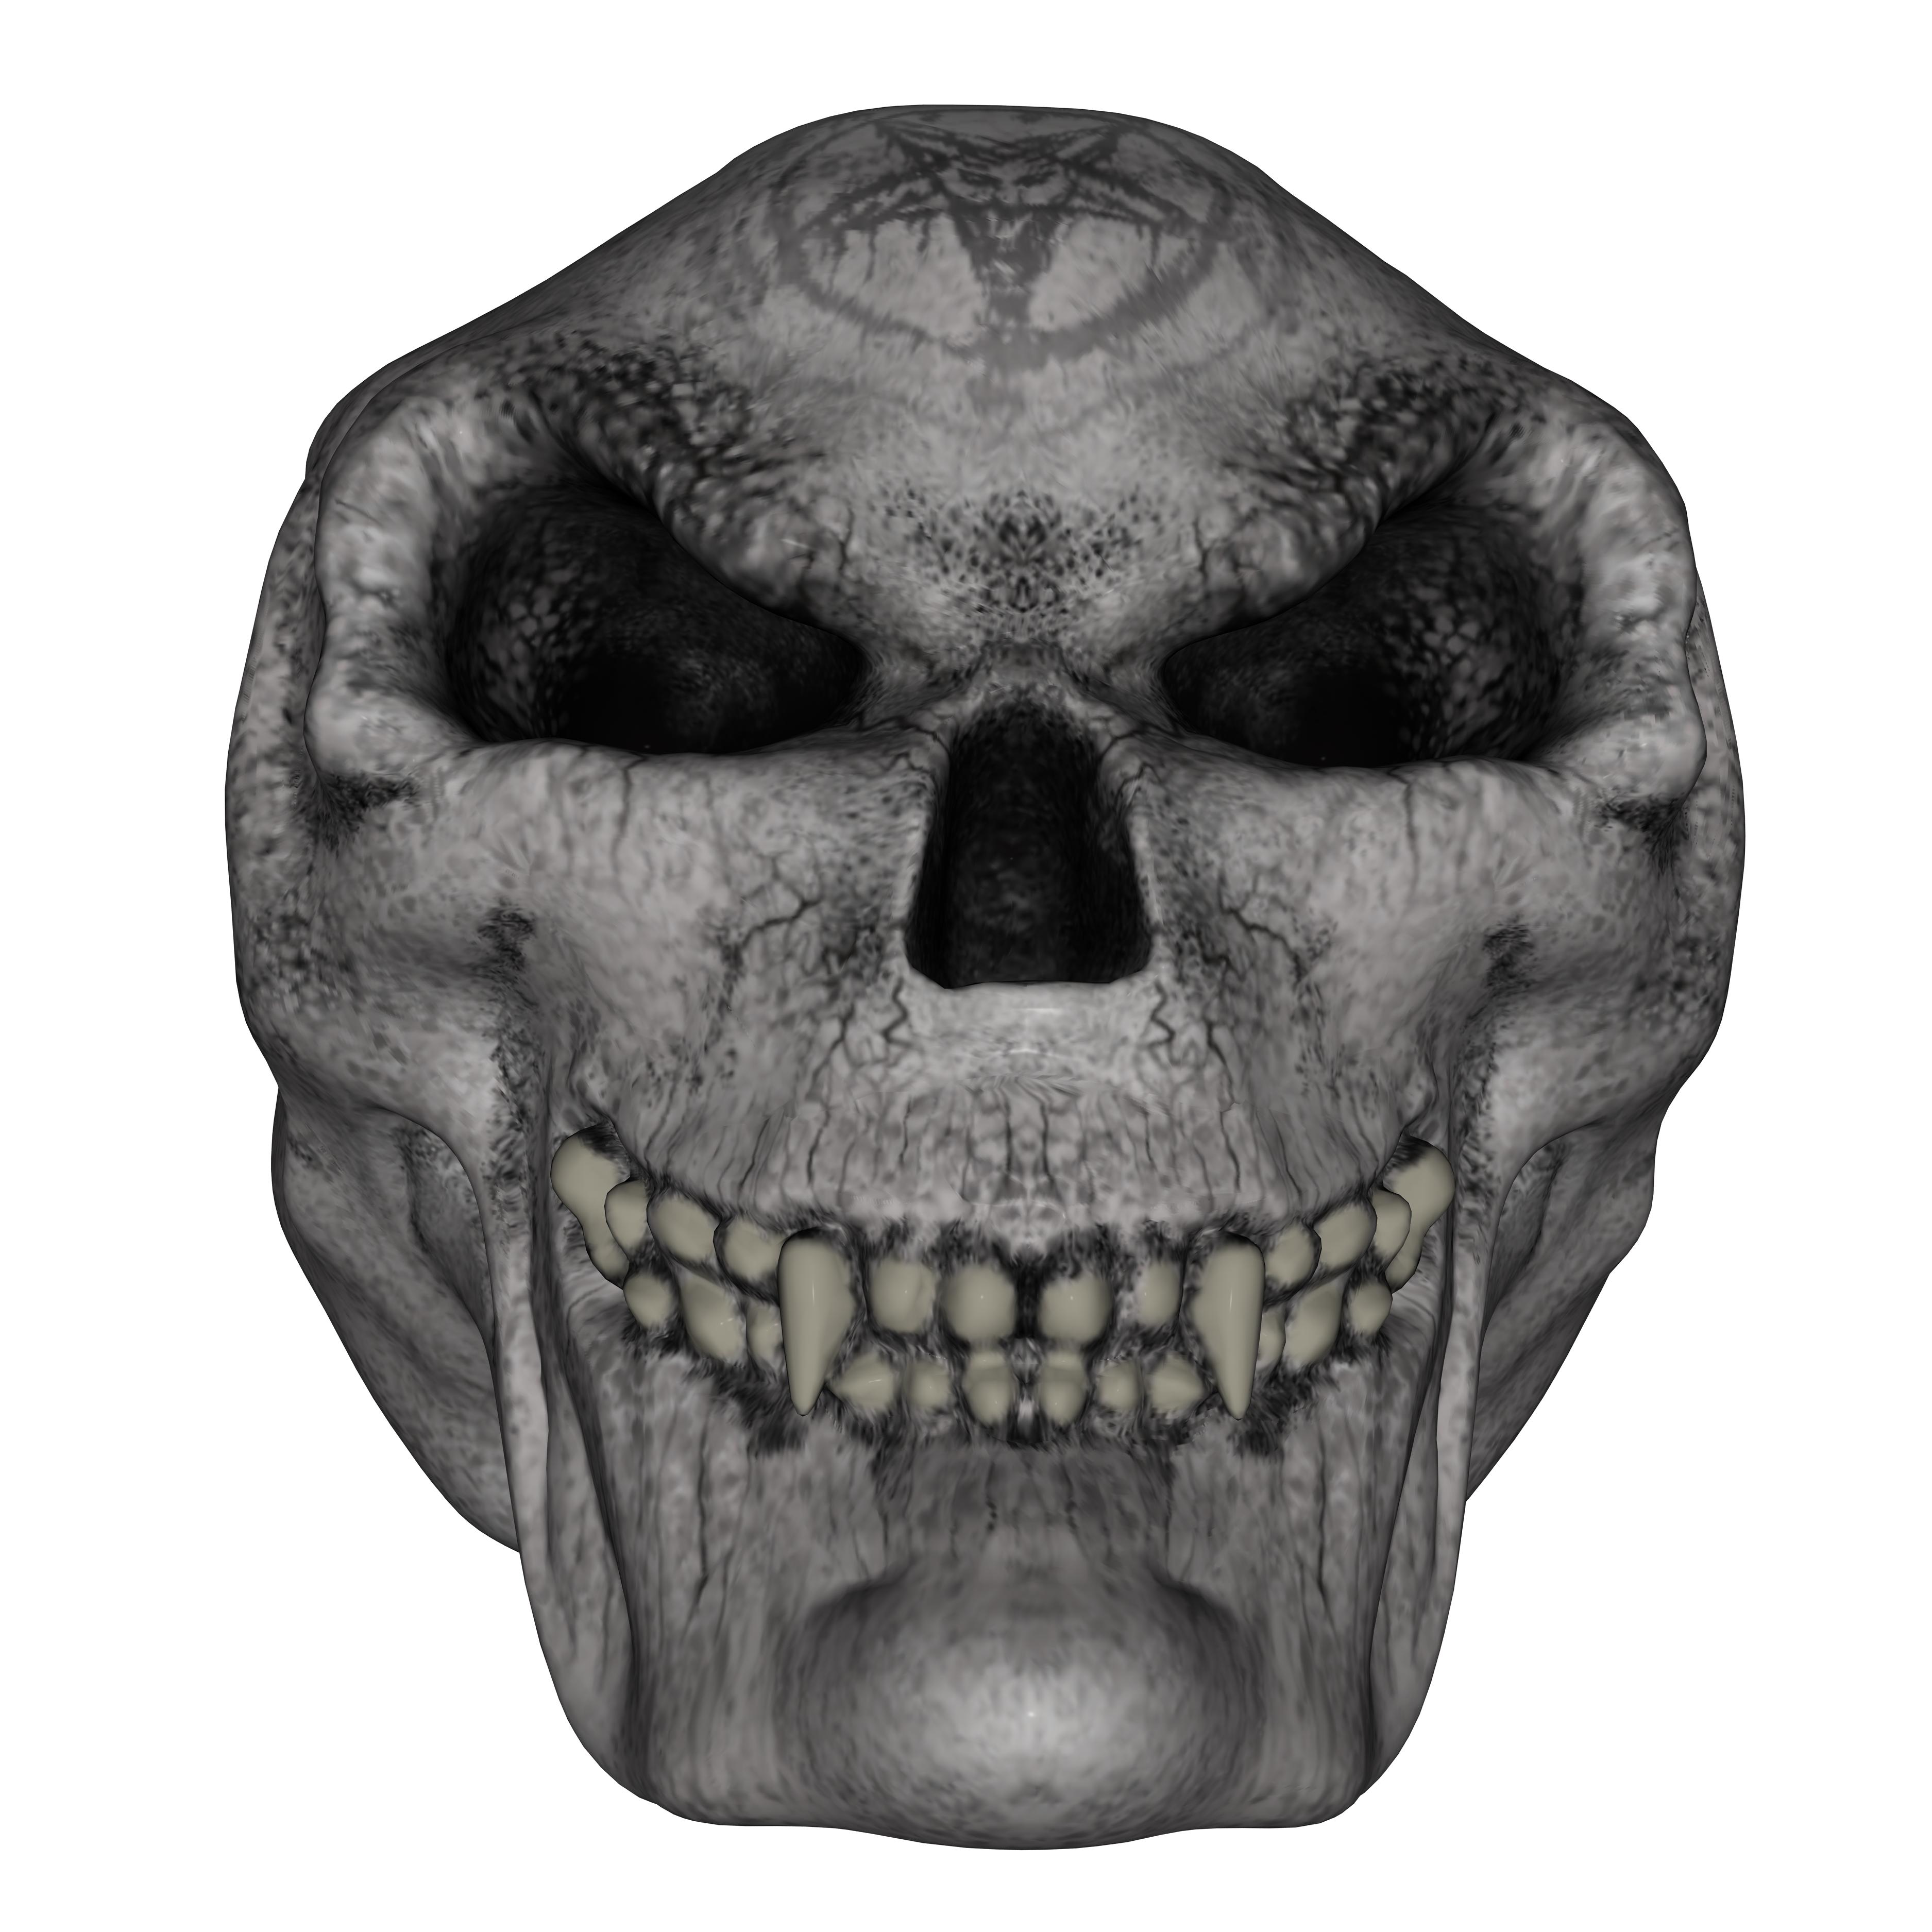 Skull, 3d, Bone, Devil, Evil, HQ Photo